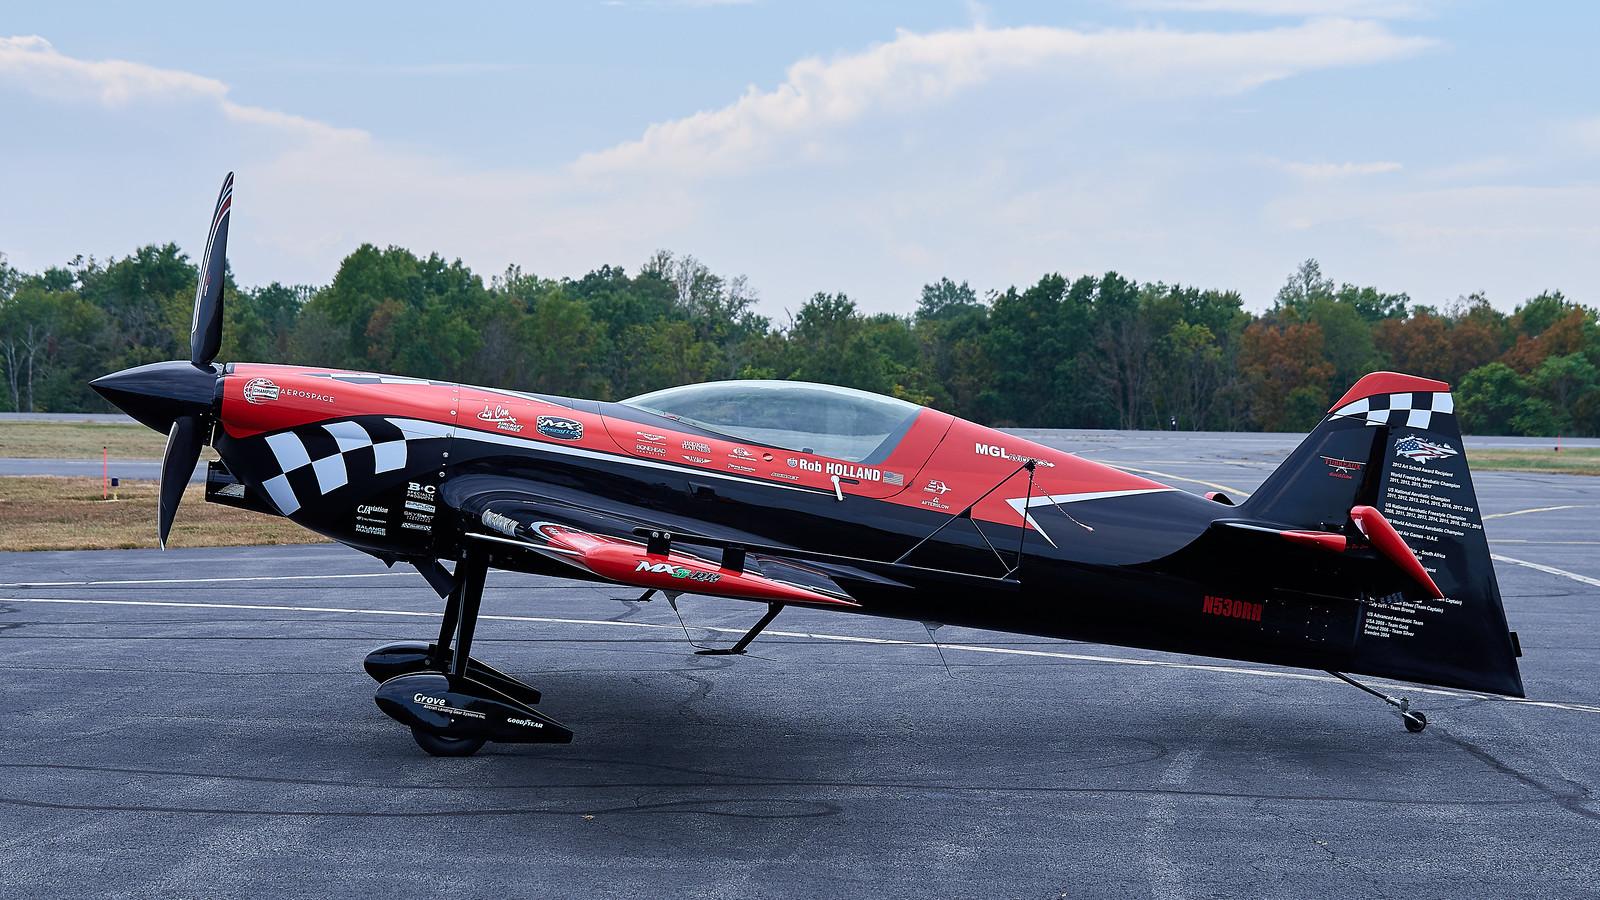 Leesburg Airshow - Rob Holland